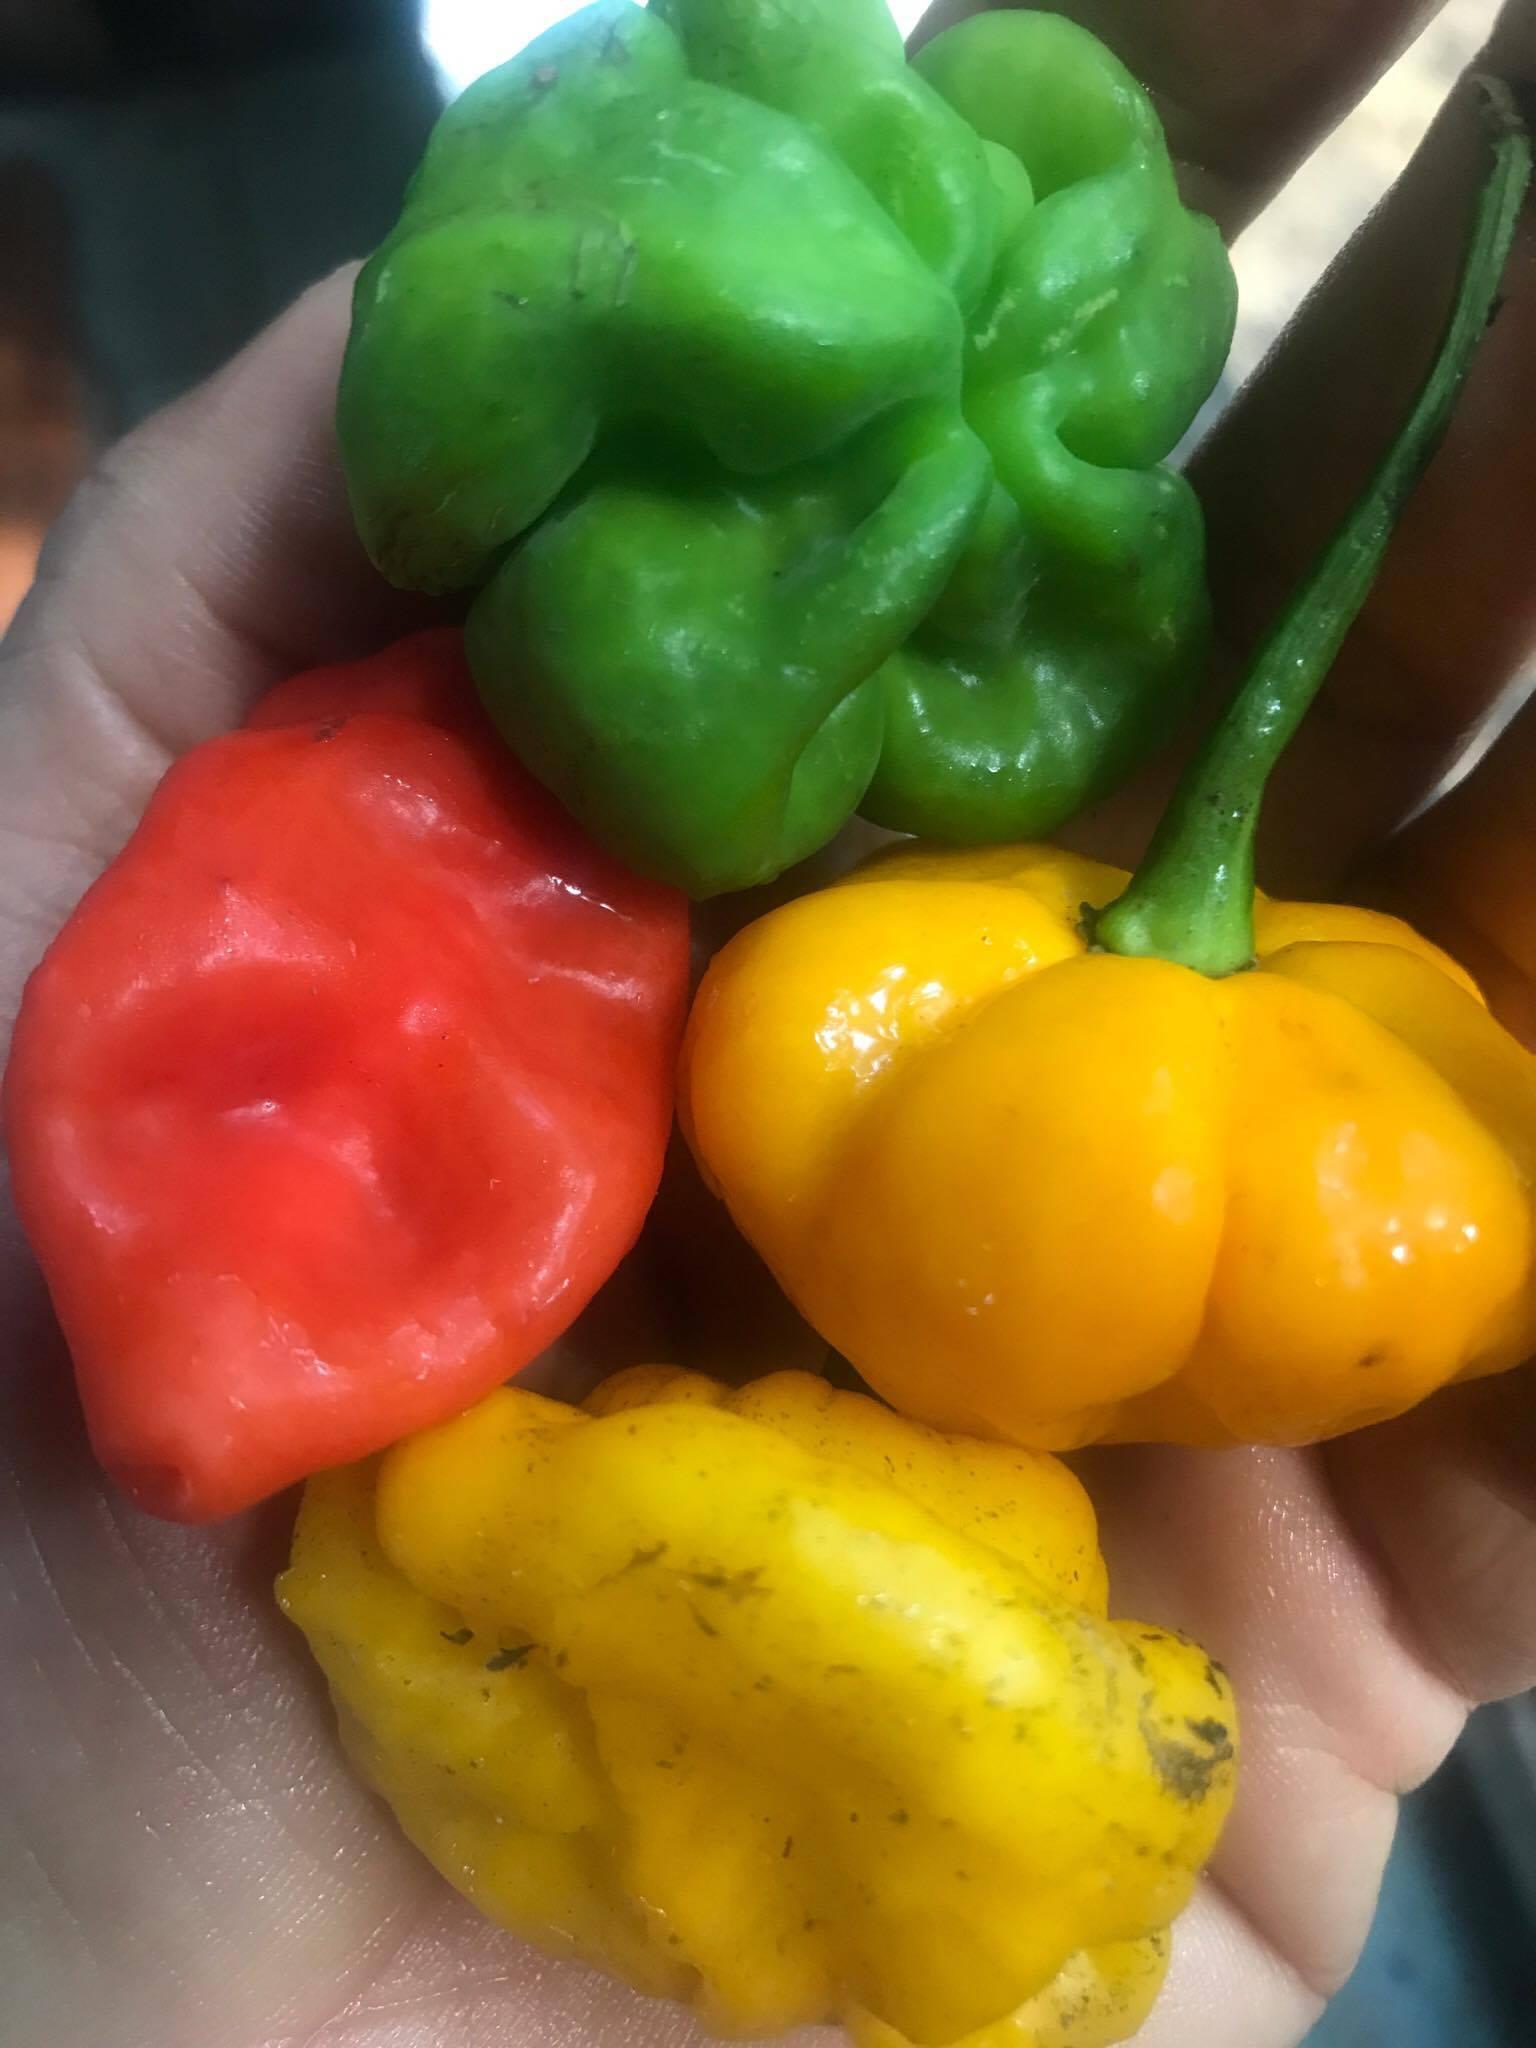 peppers anyone? farm fresh in Jamaica!